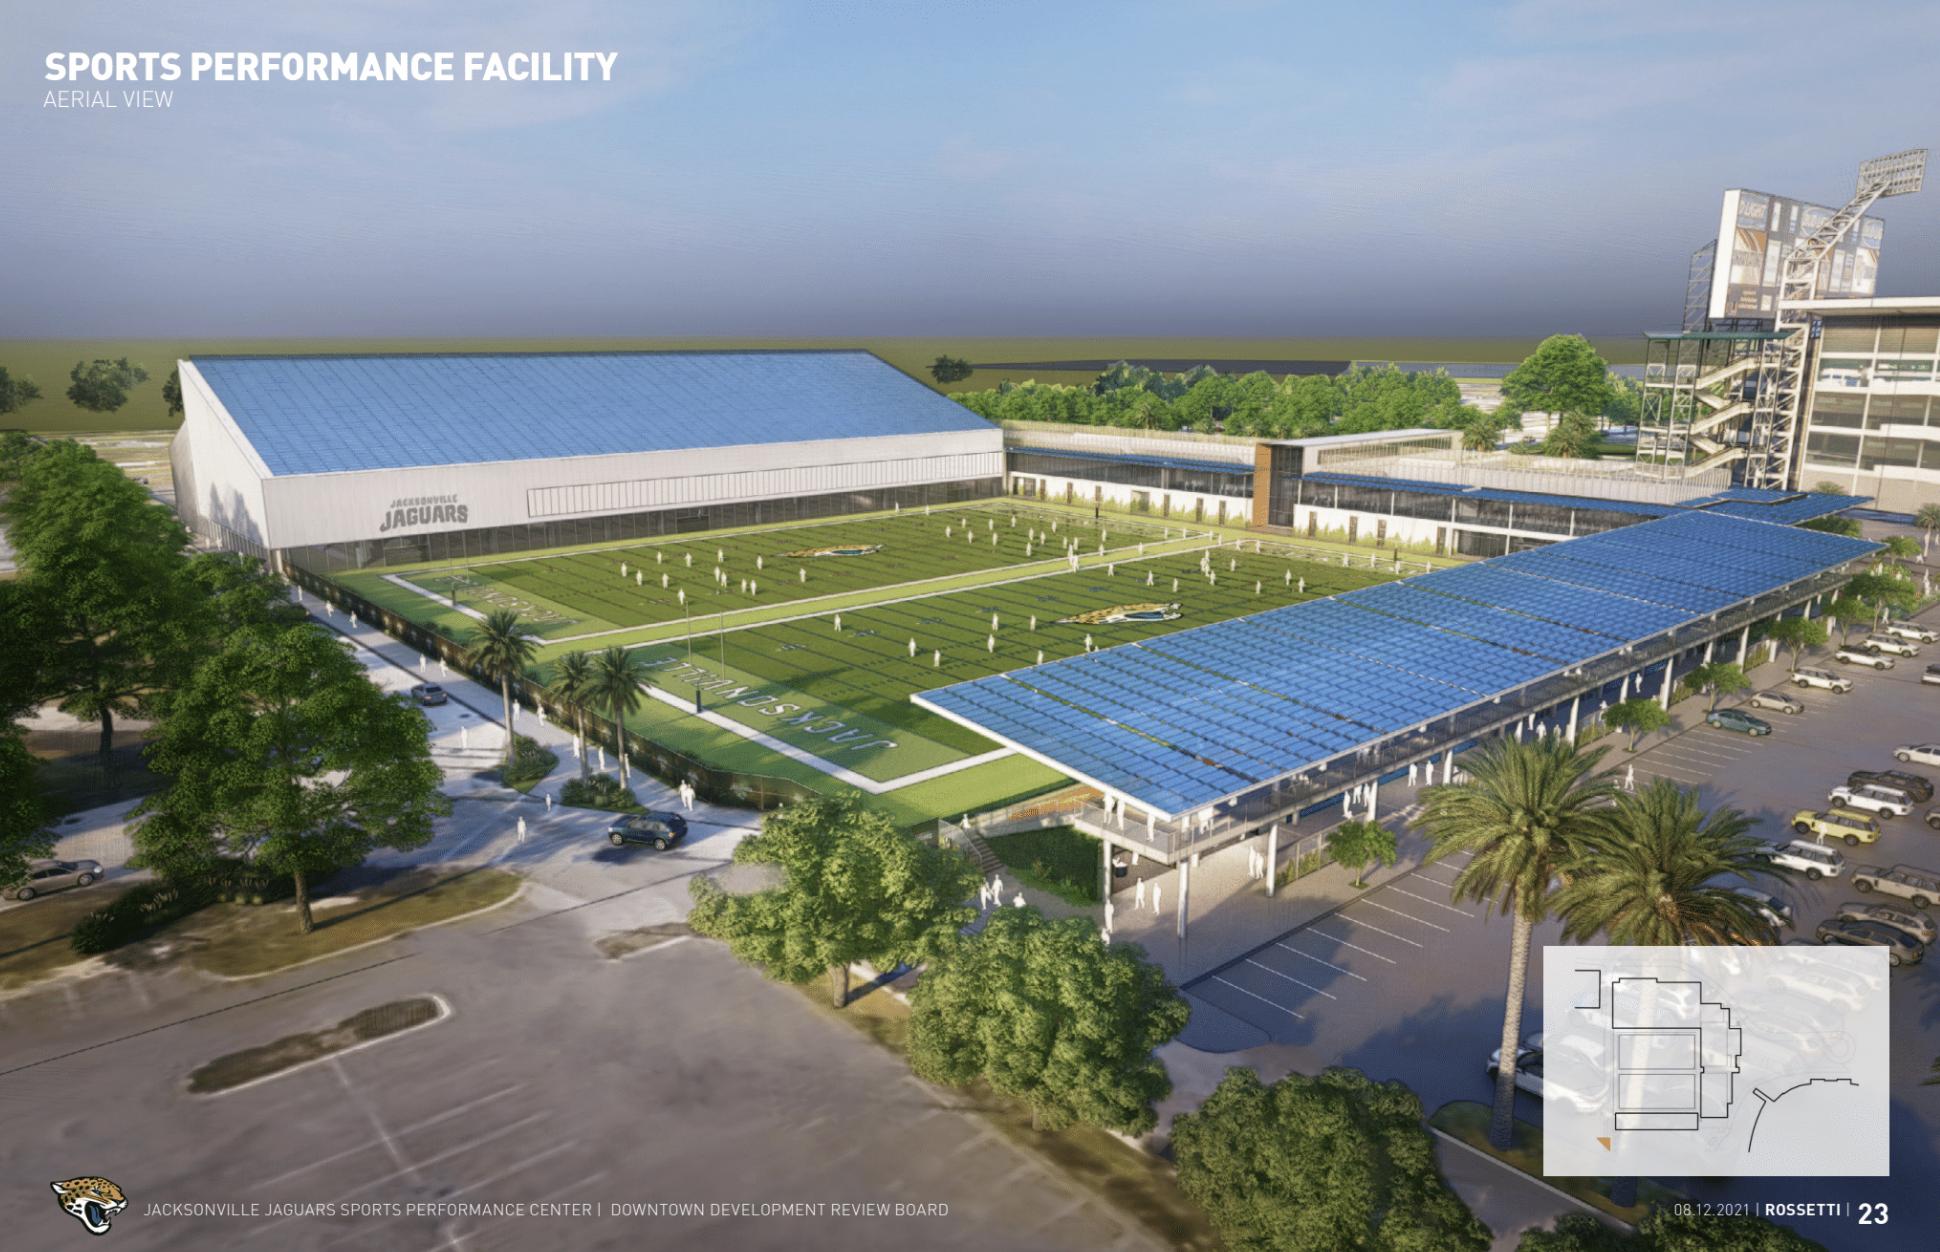 Jacksonville Jaguars Sports Performance Center. Designed by Rossetti.